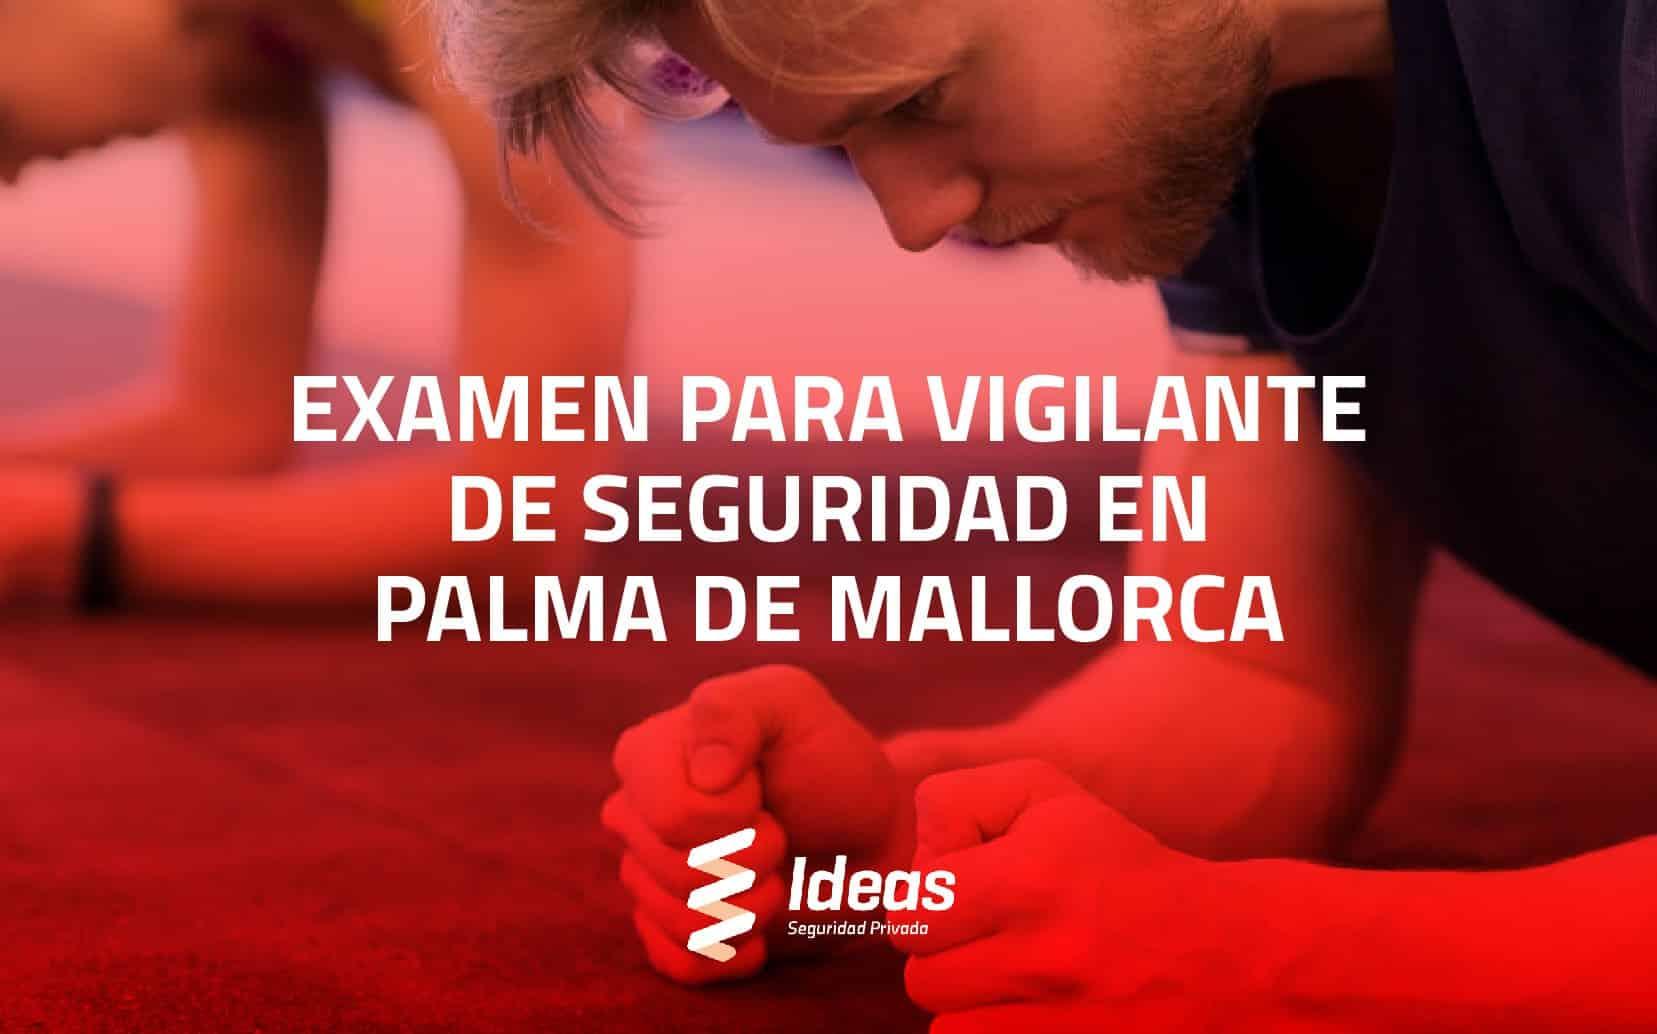 Examen para Vigilante de Seguridad en Palma de Mallorca